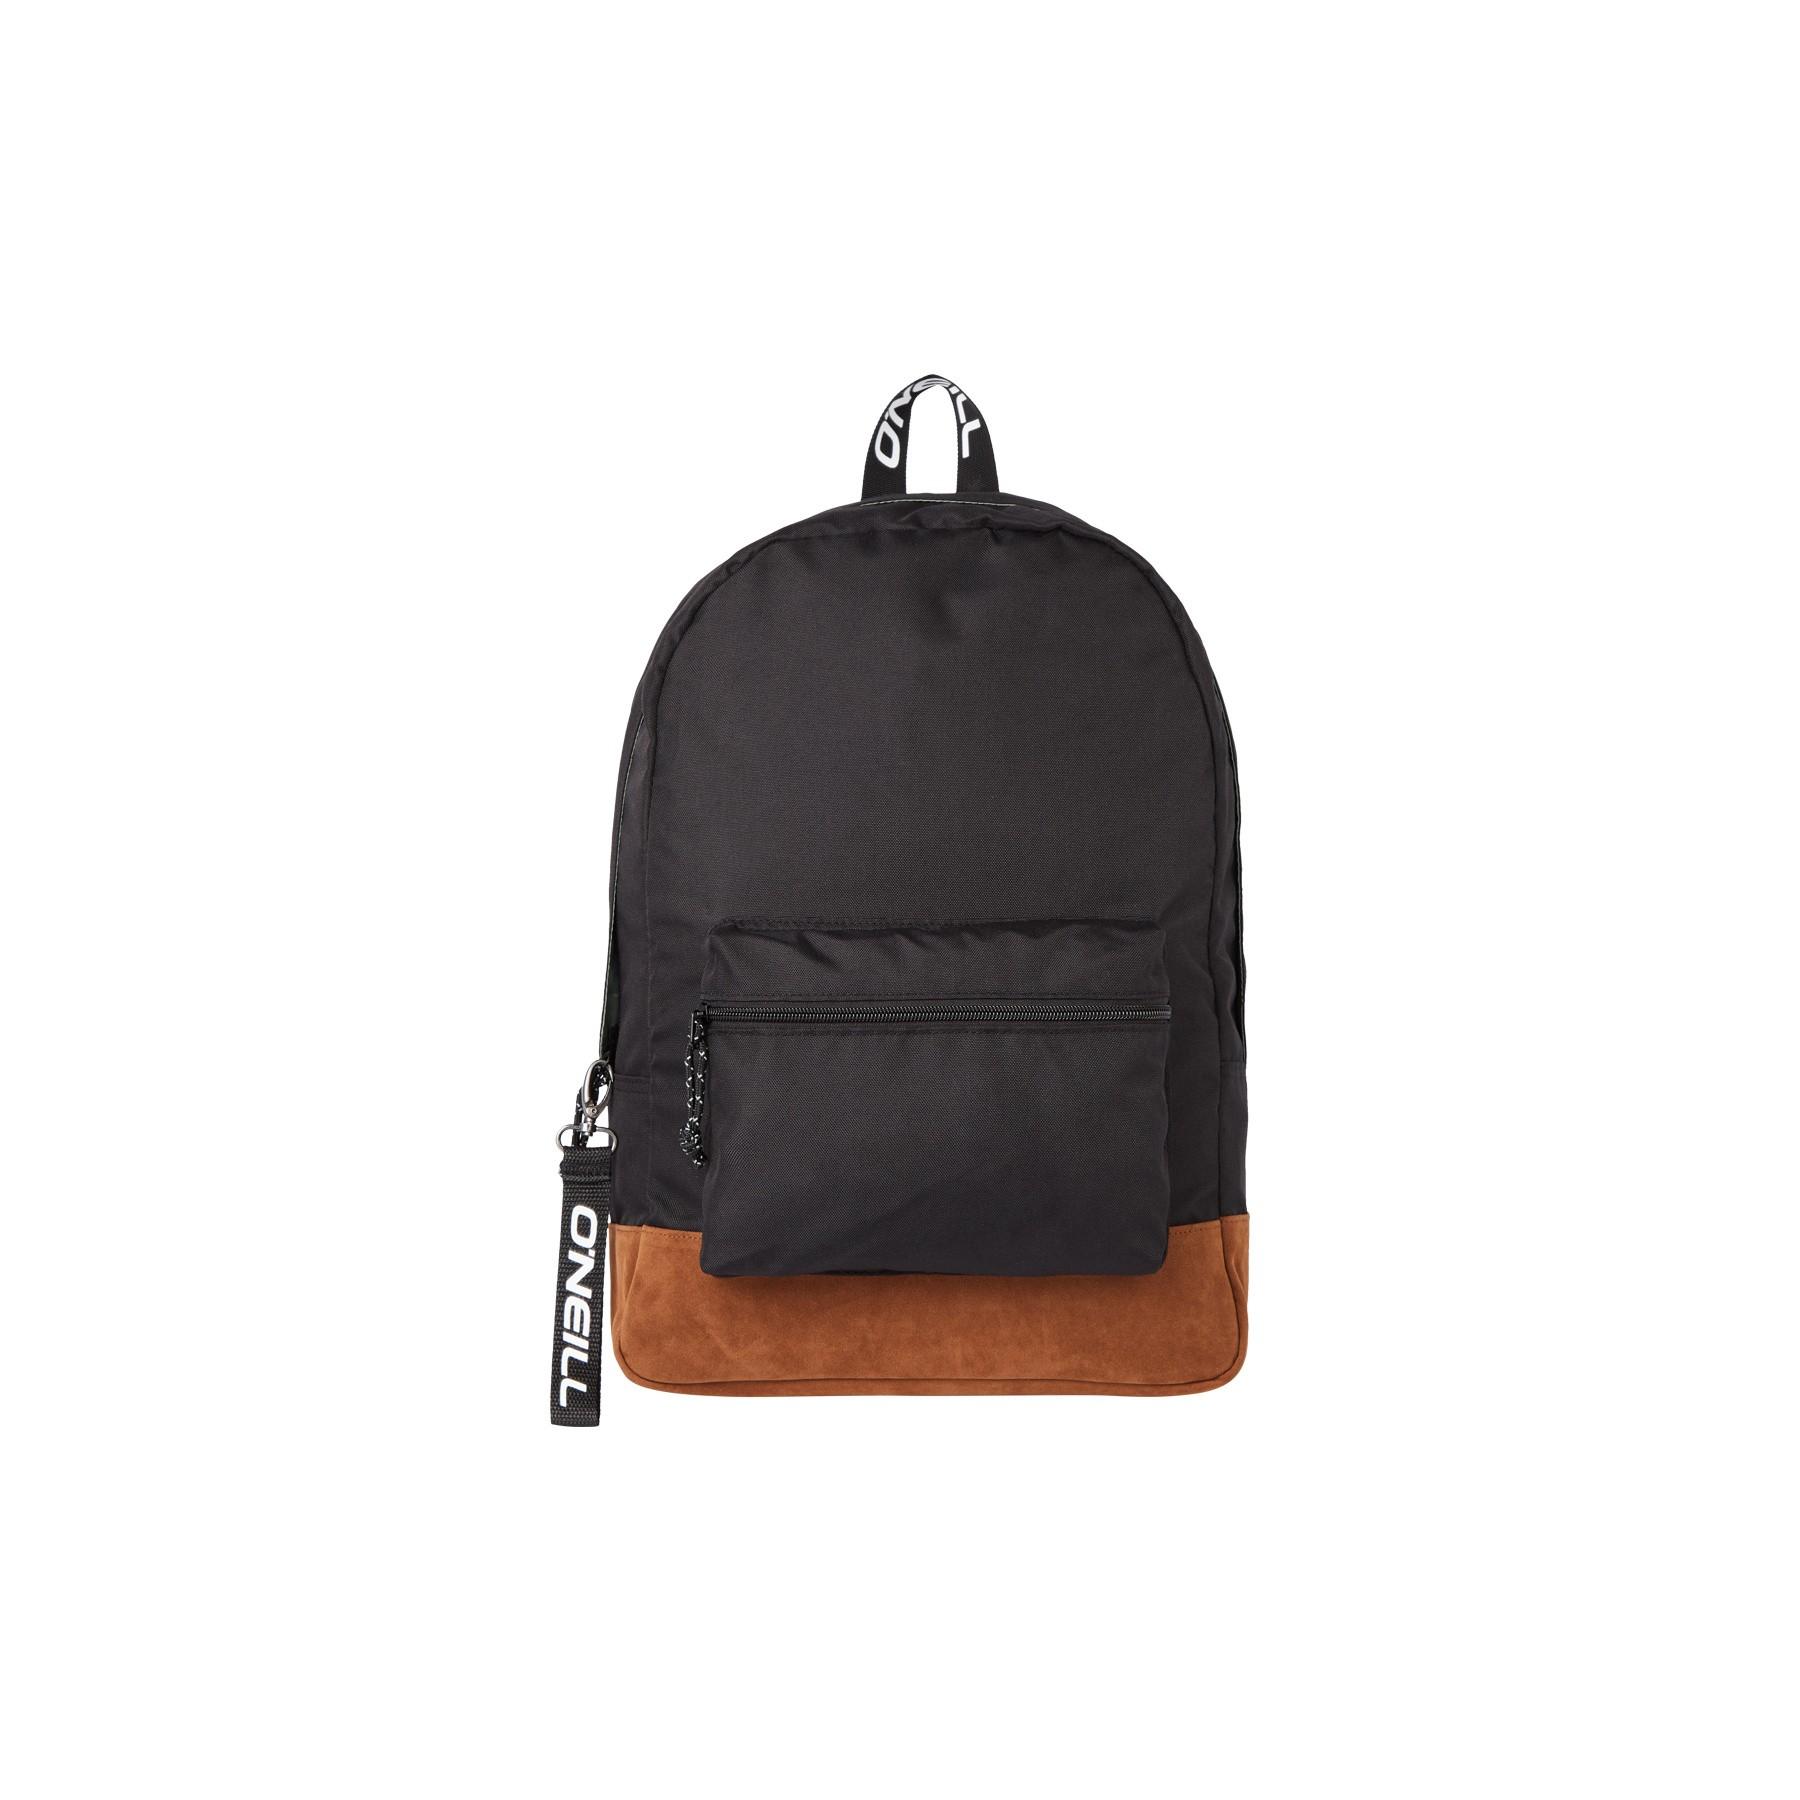 O'Neill Coastline Plus Backpack 9010 Black Out